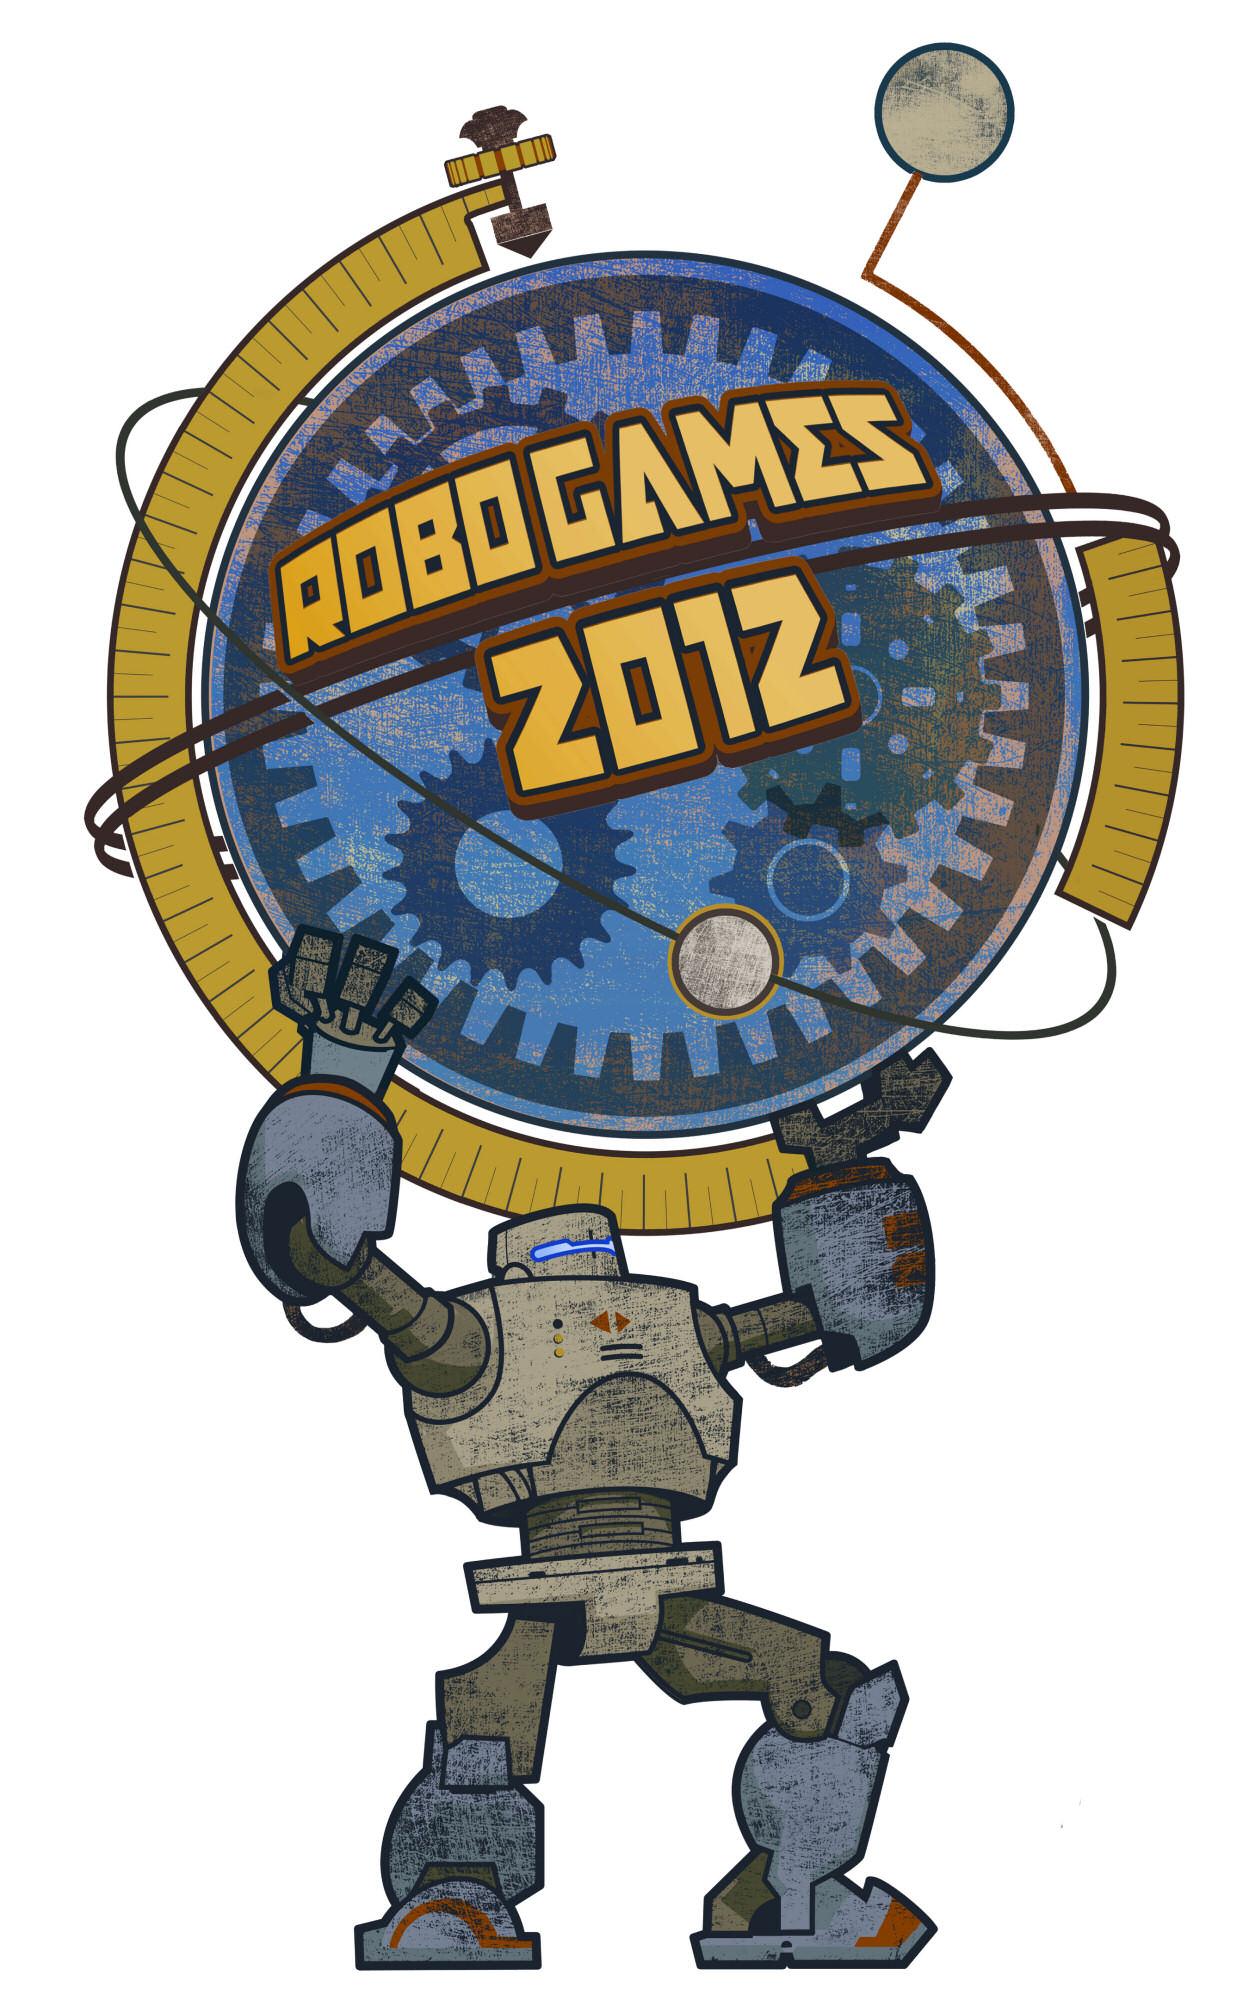 RoboGames 2012